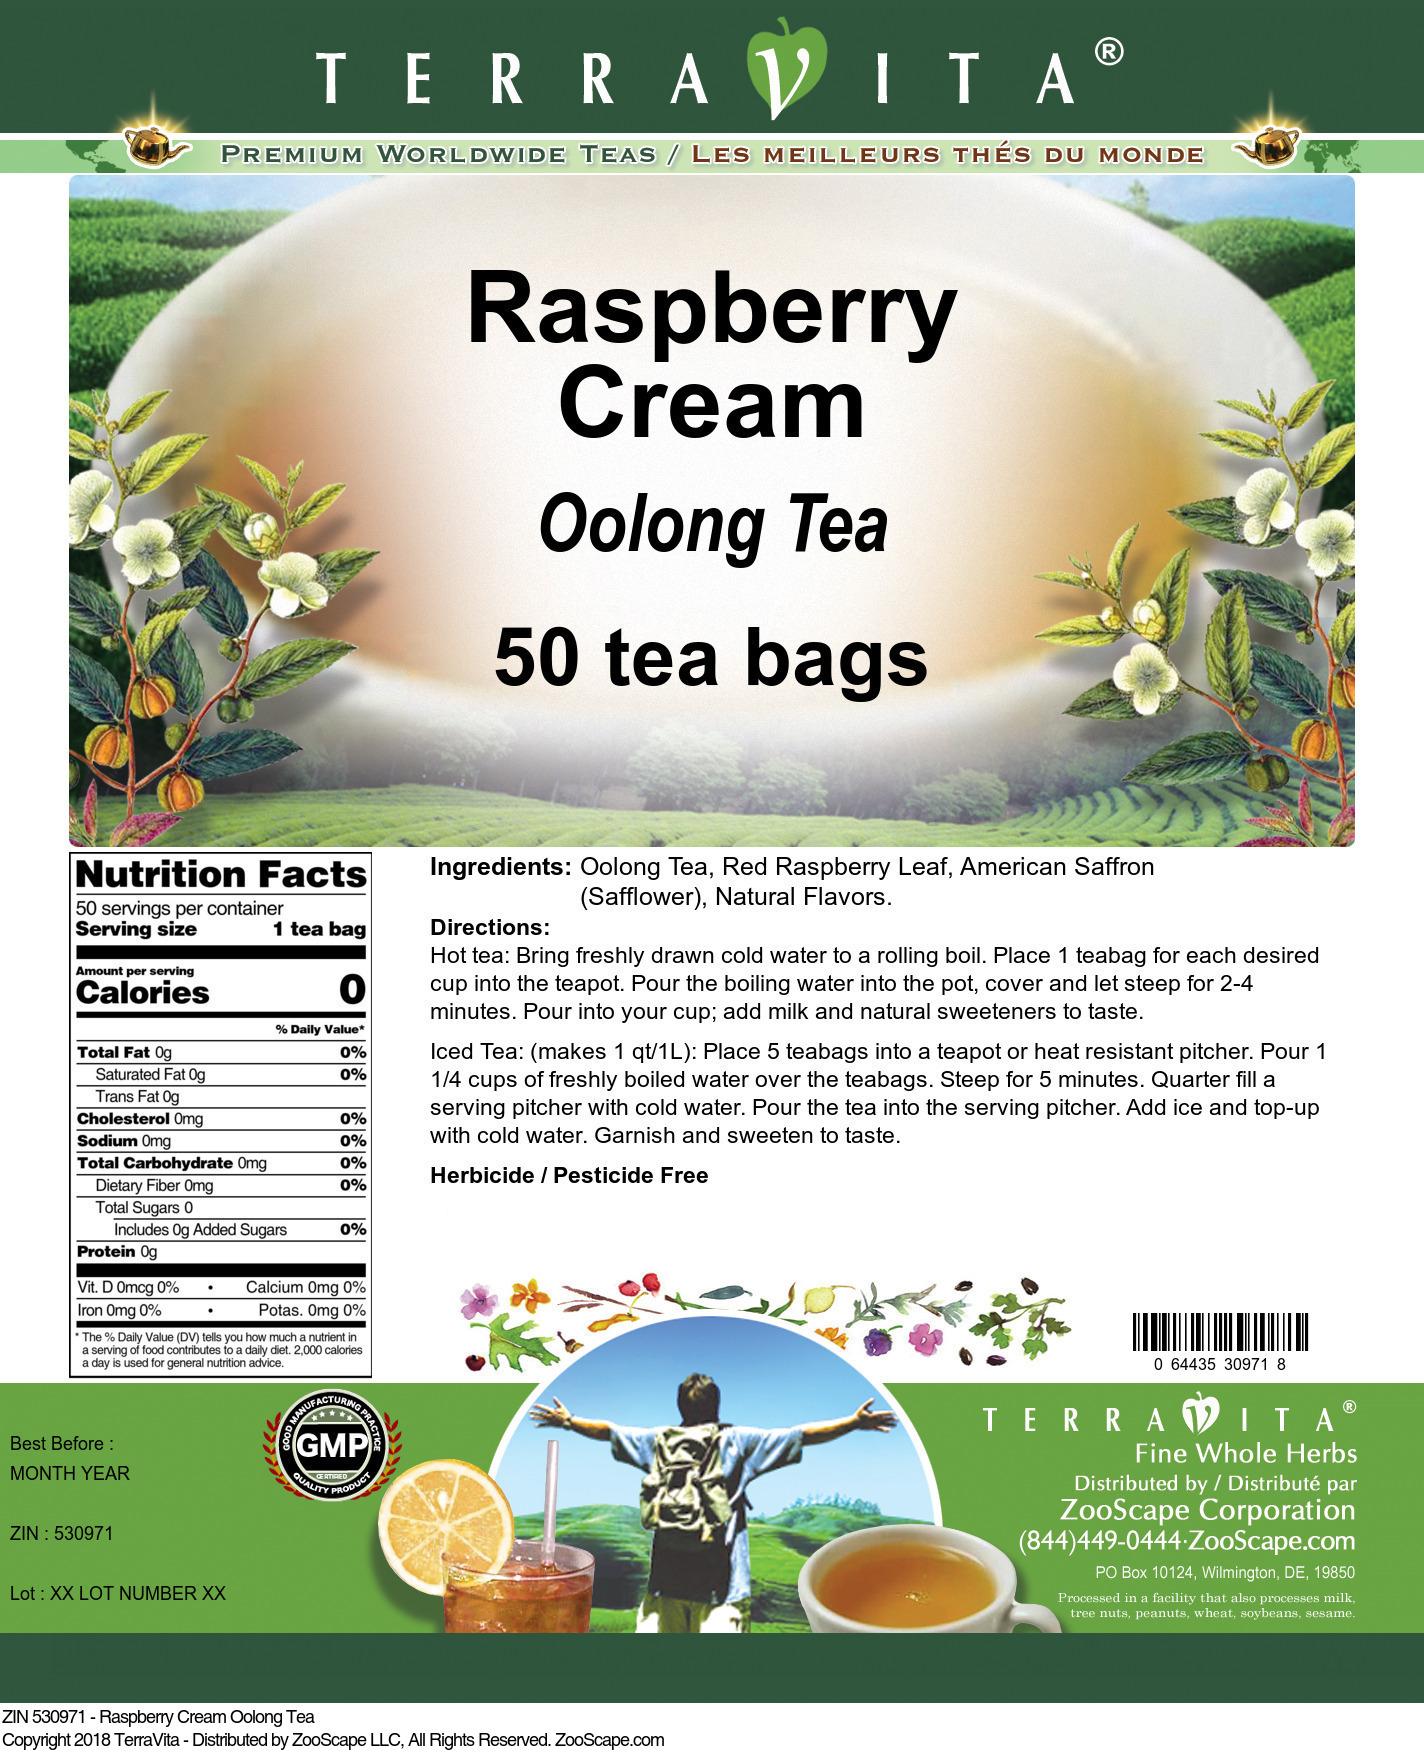 Raspberry Cream Oolong Tea